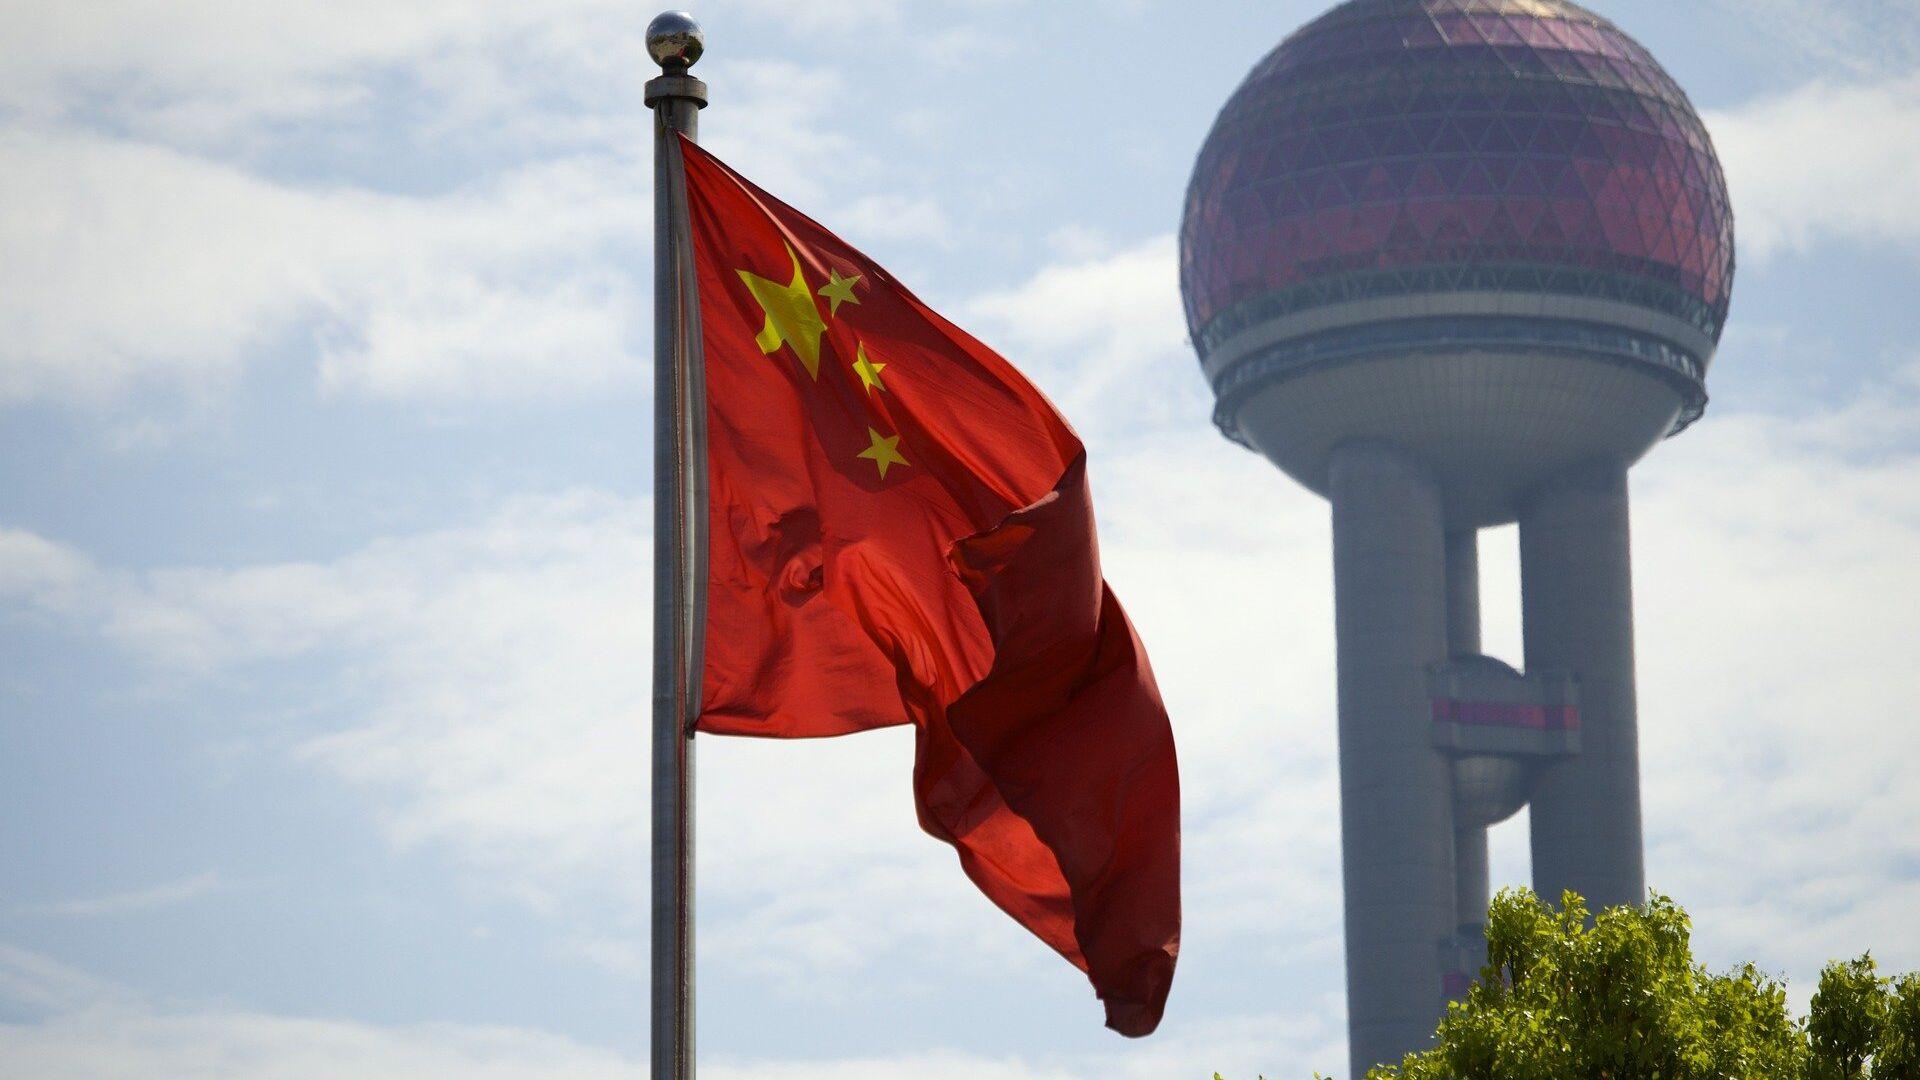 Bandera de China - Sputnik Mundo, 1920, 11.06.2021